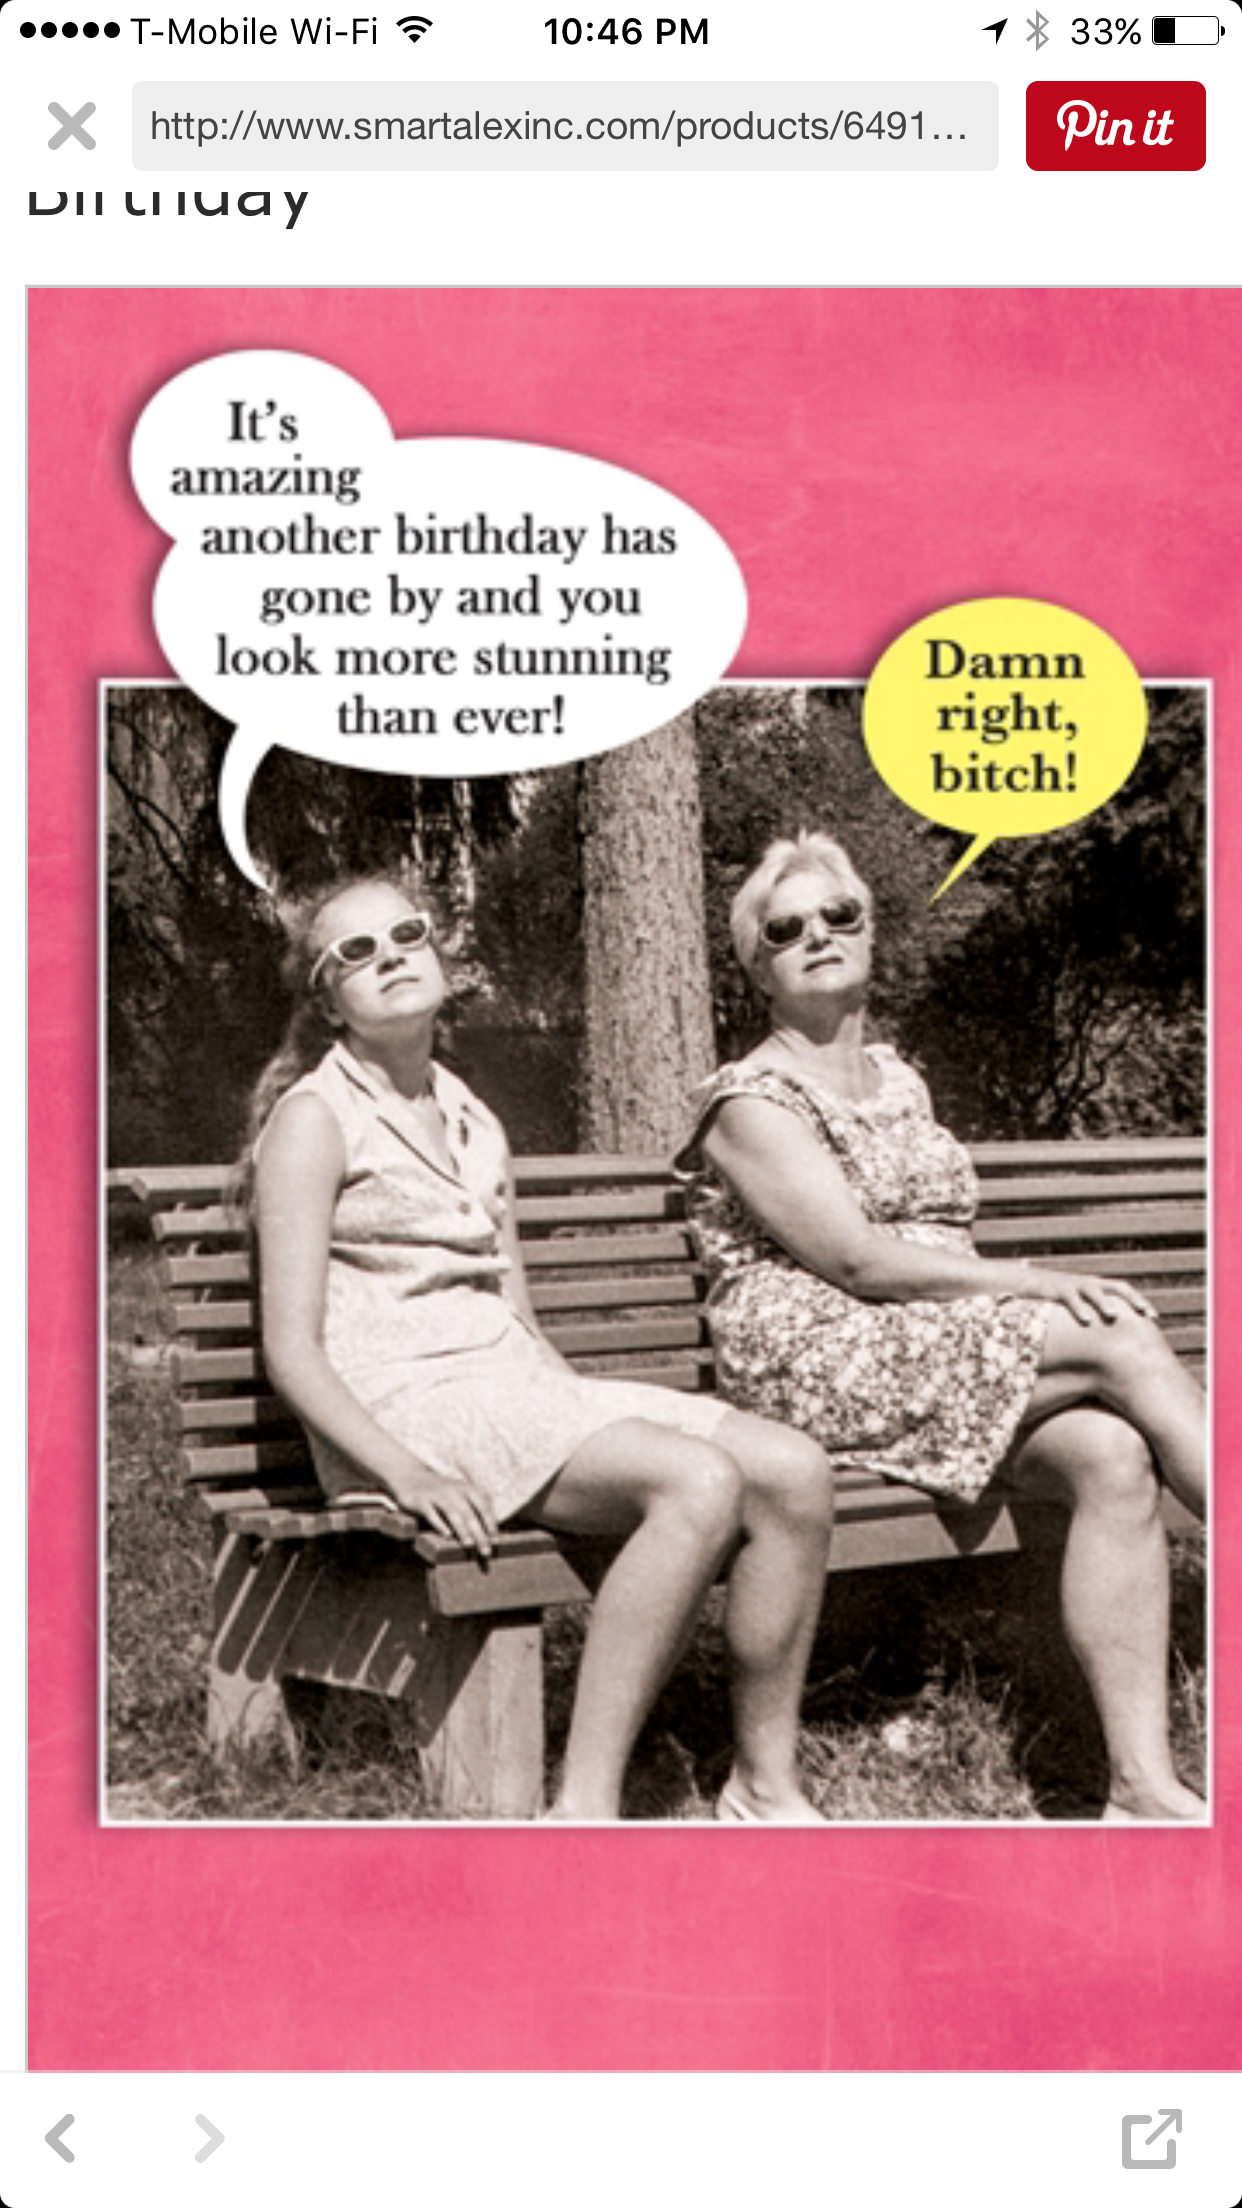 Pin by Lisa Egan on America | Birthday ecards funny, Happy ...